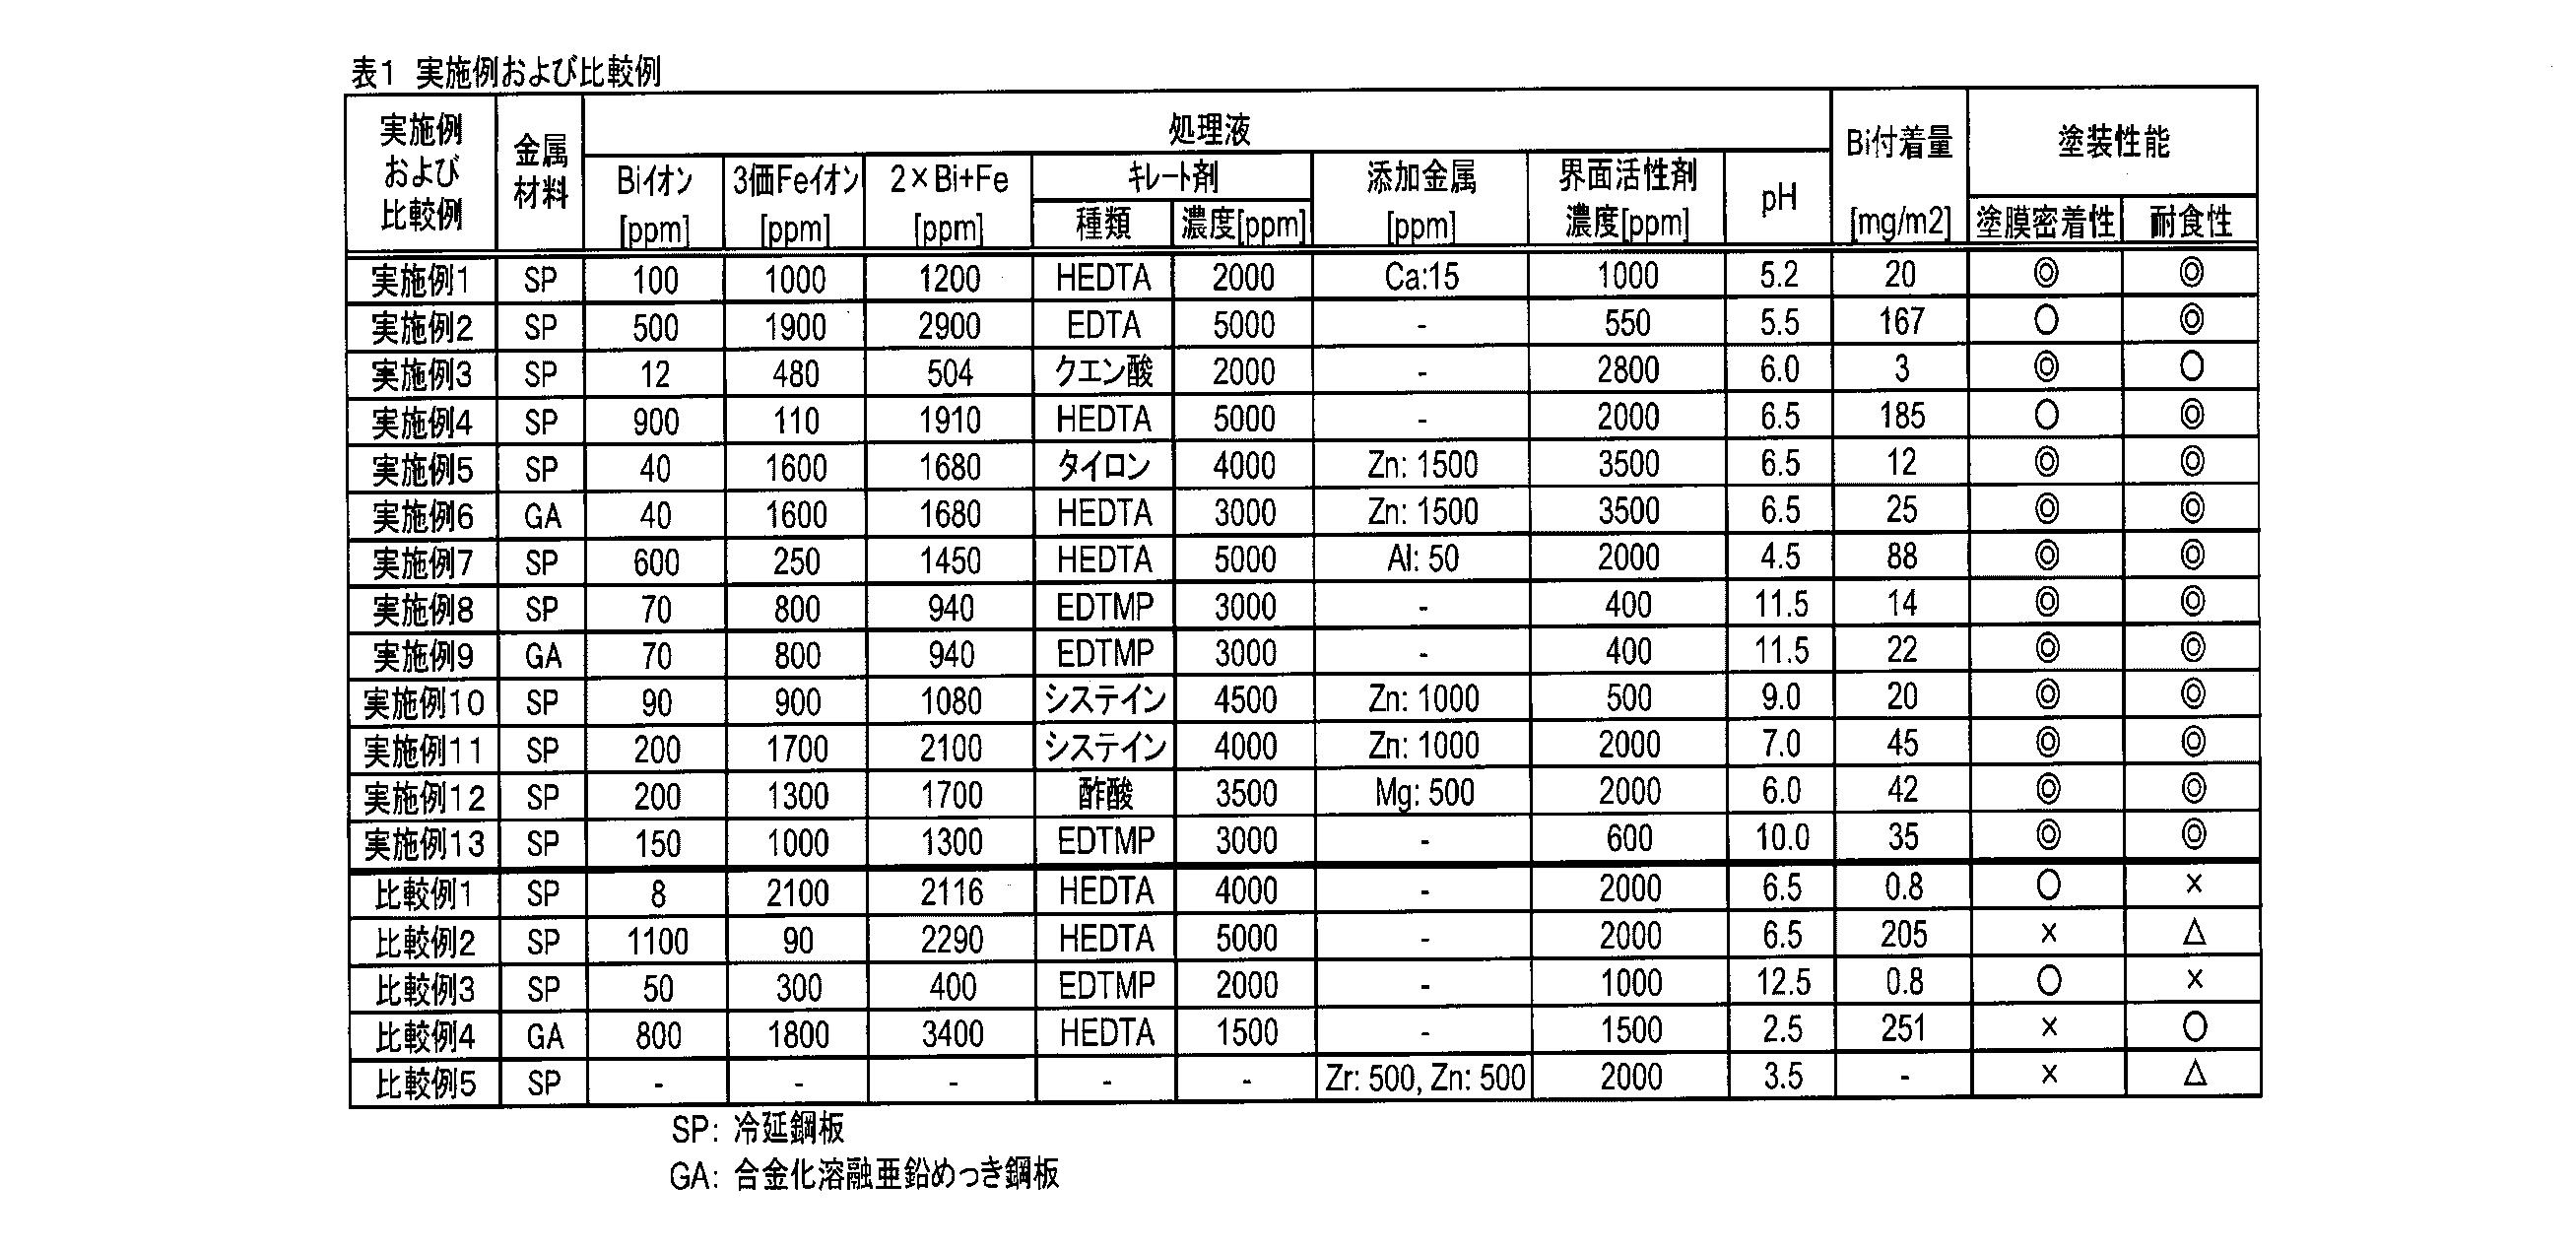 WO2011010472A1 - 金属表面処理液および金属材料の表面処理方法         - Google PatentsFamily